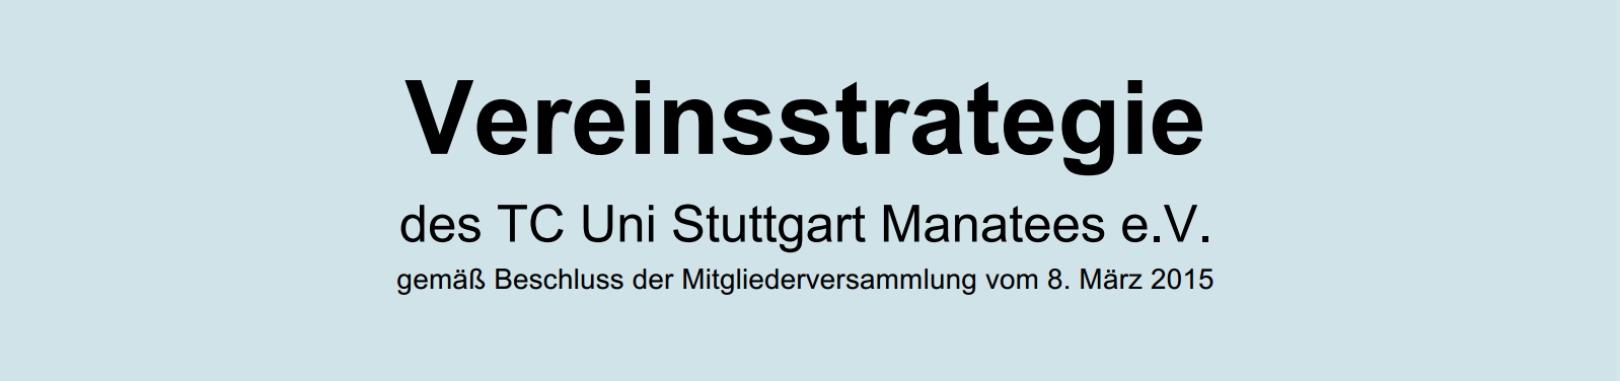 TC-Manatees_Vereinsstrategie_oben